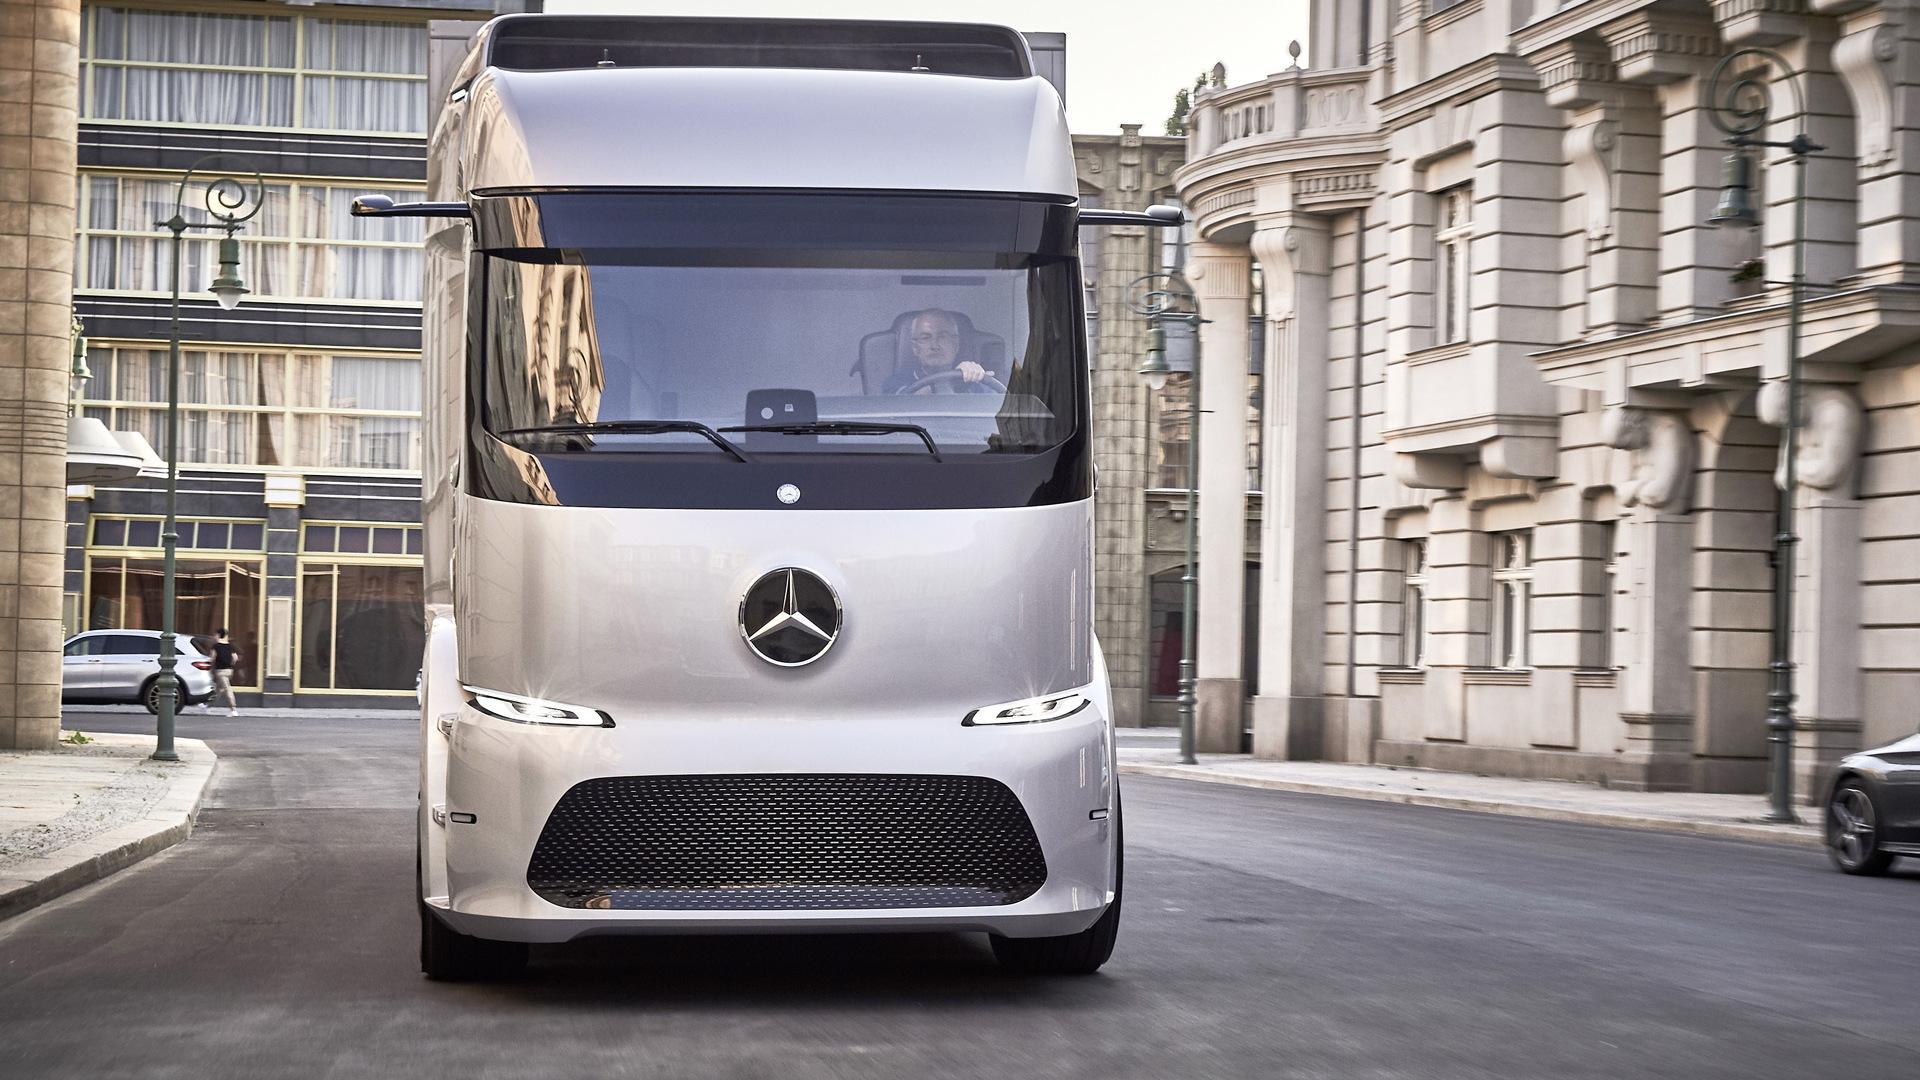 Mercedes-Benz Urban eTruck concept, 2016 IAA Commercial Vehicles